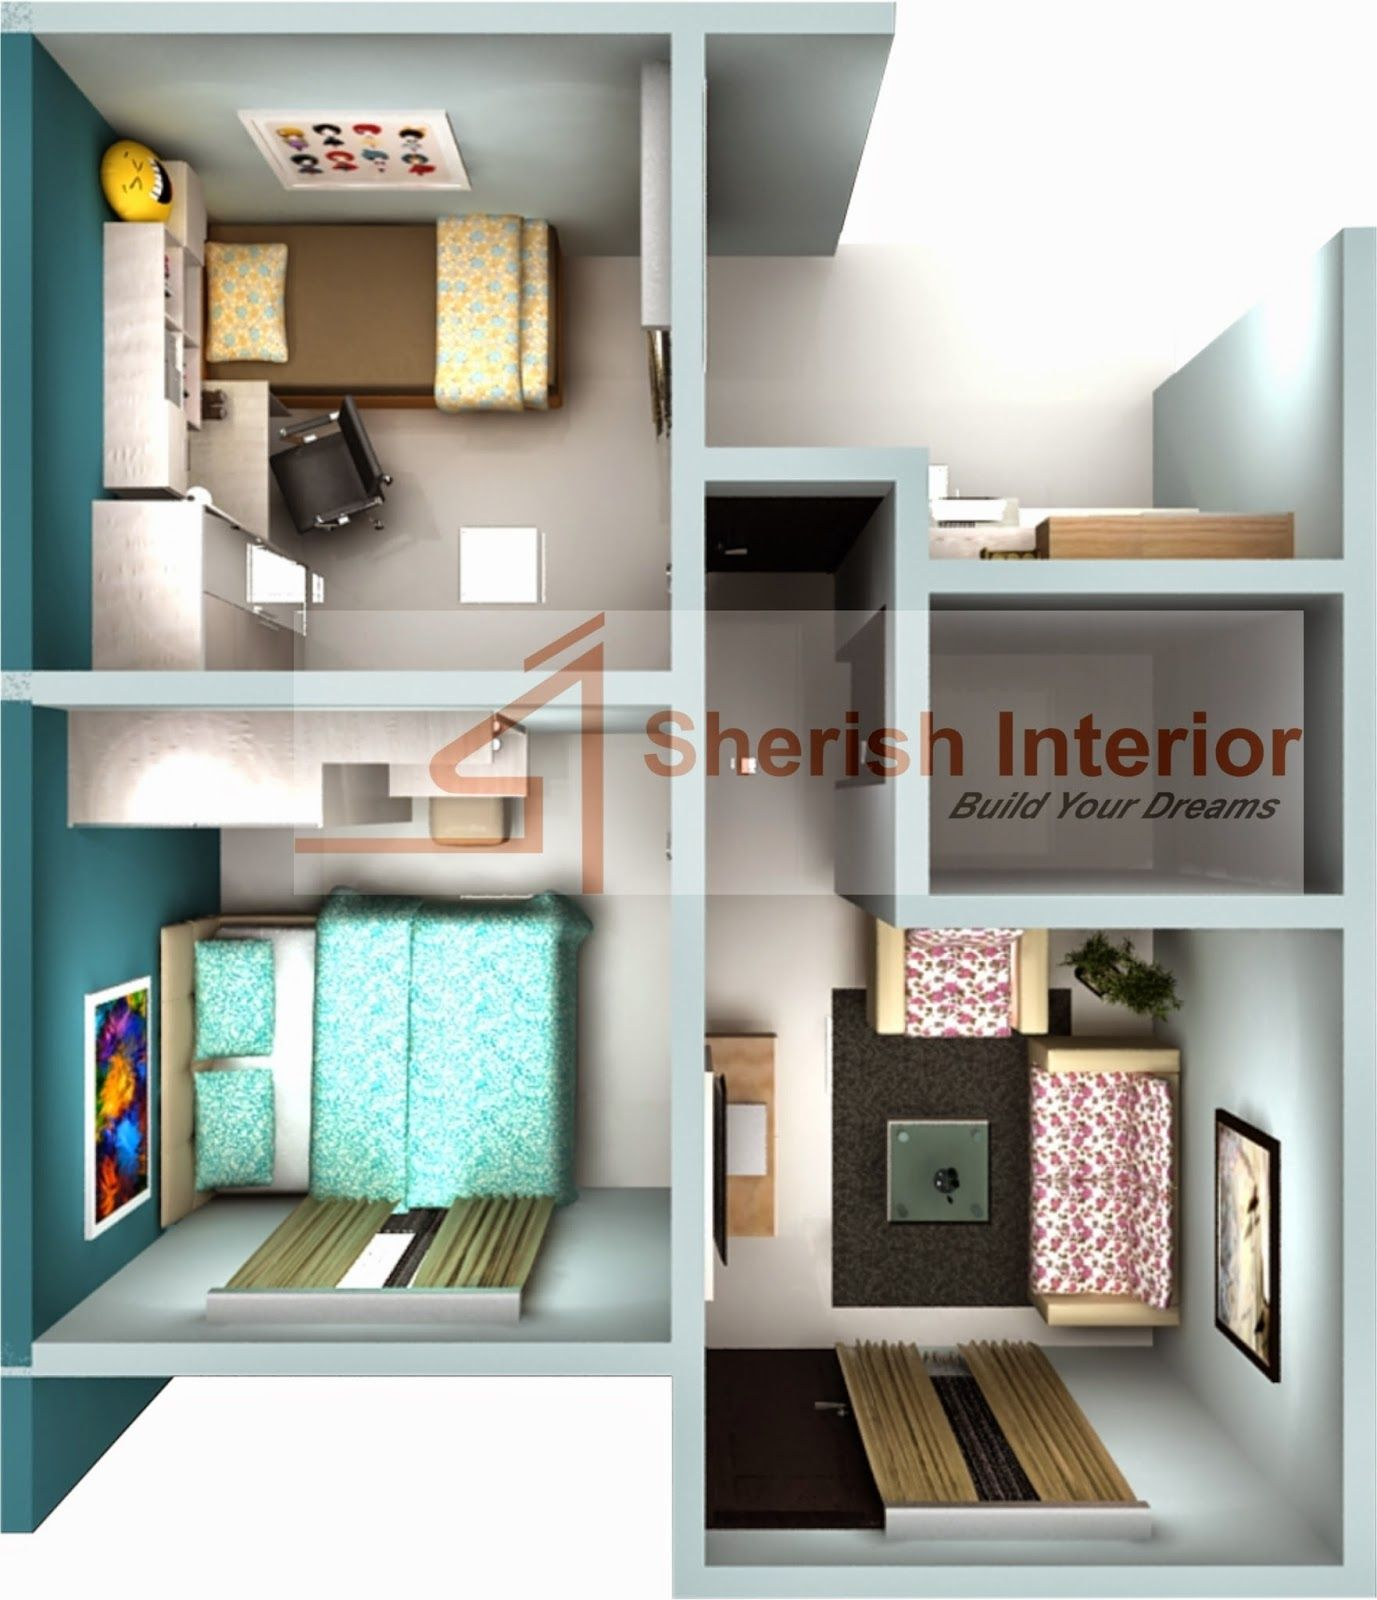 Sherish interior rumah tinggal type also ona nurdiana onurdiana on pinterest rh